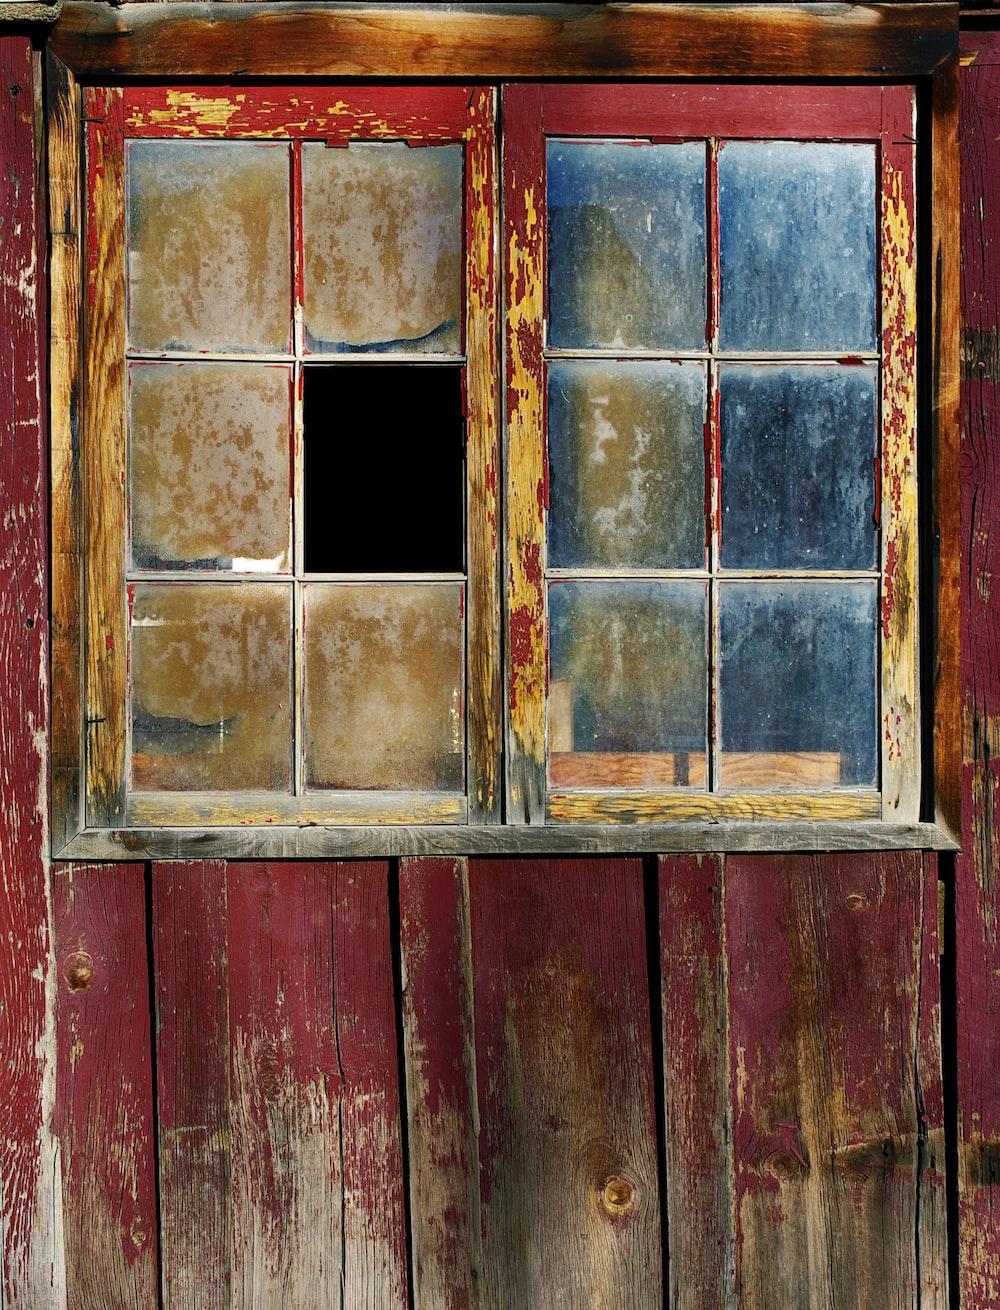 red wooden framed glass broken window